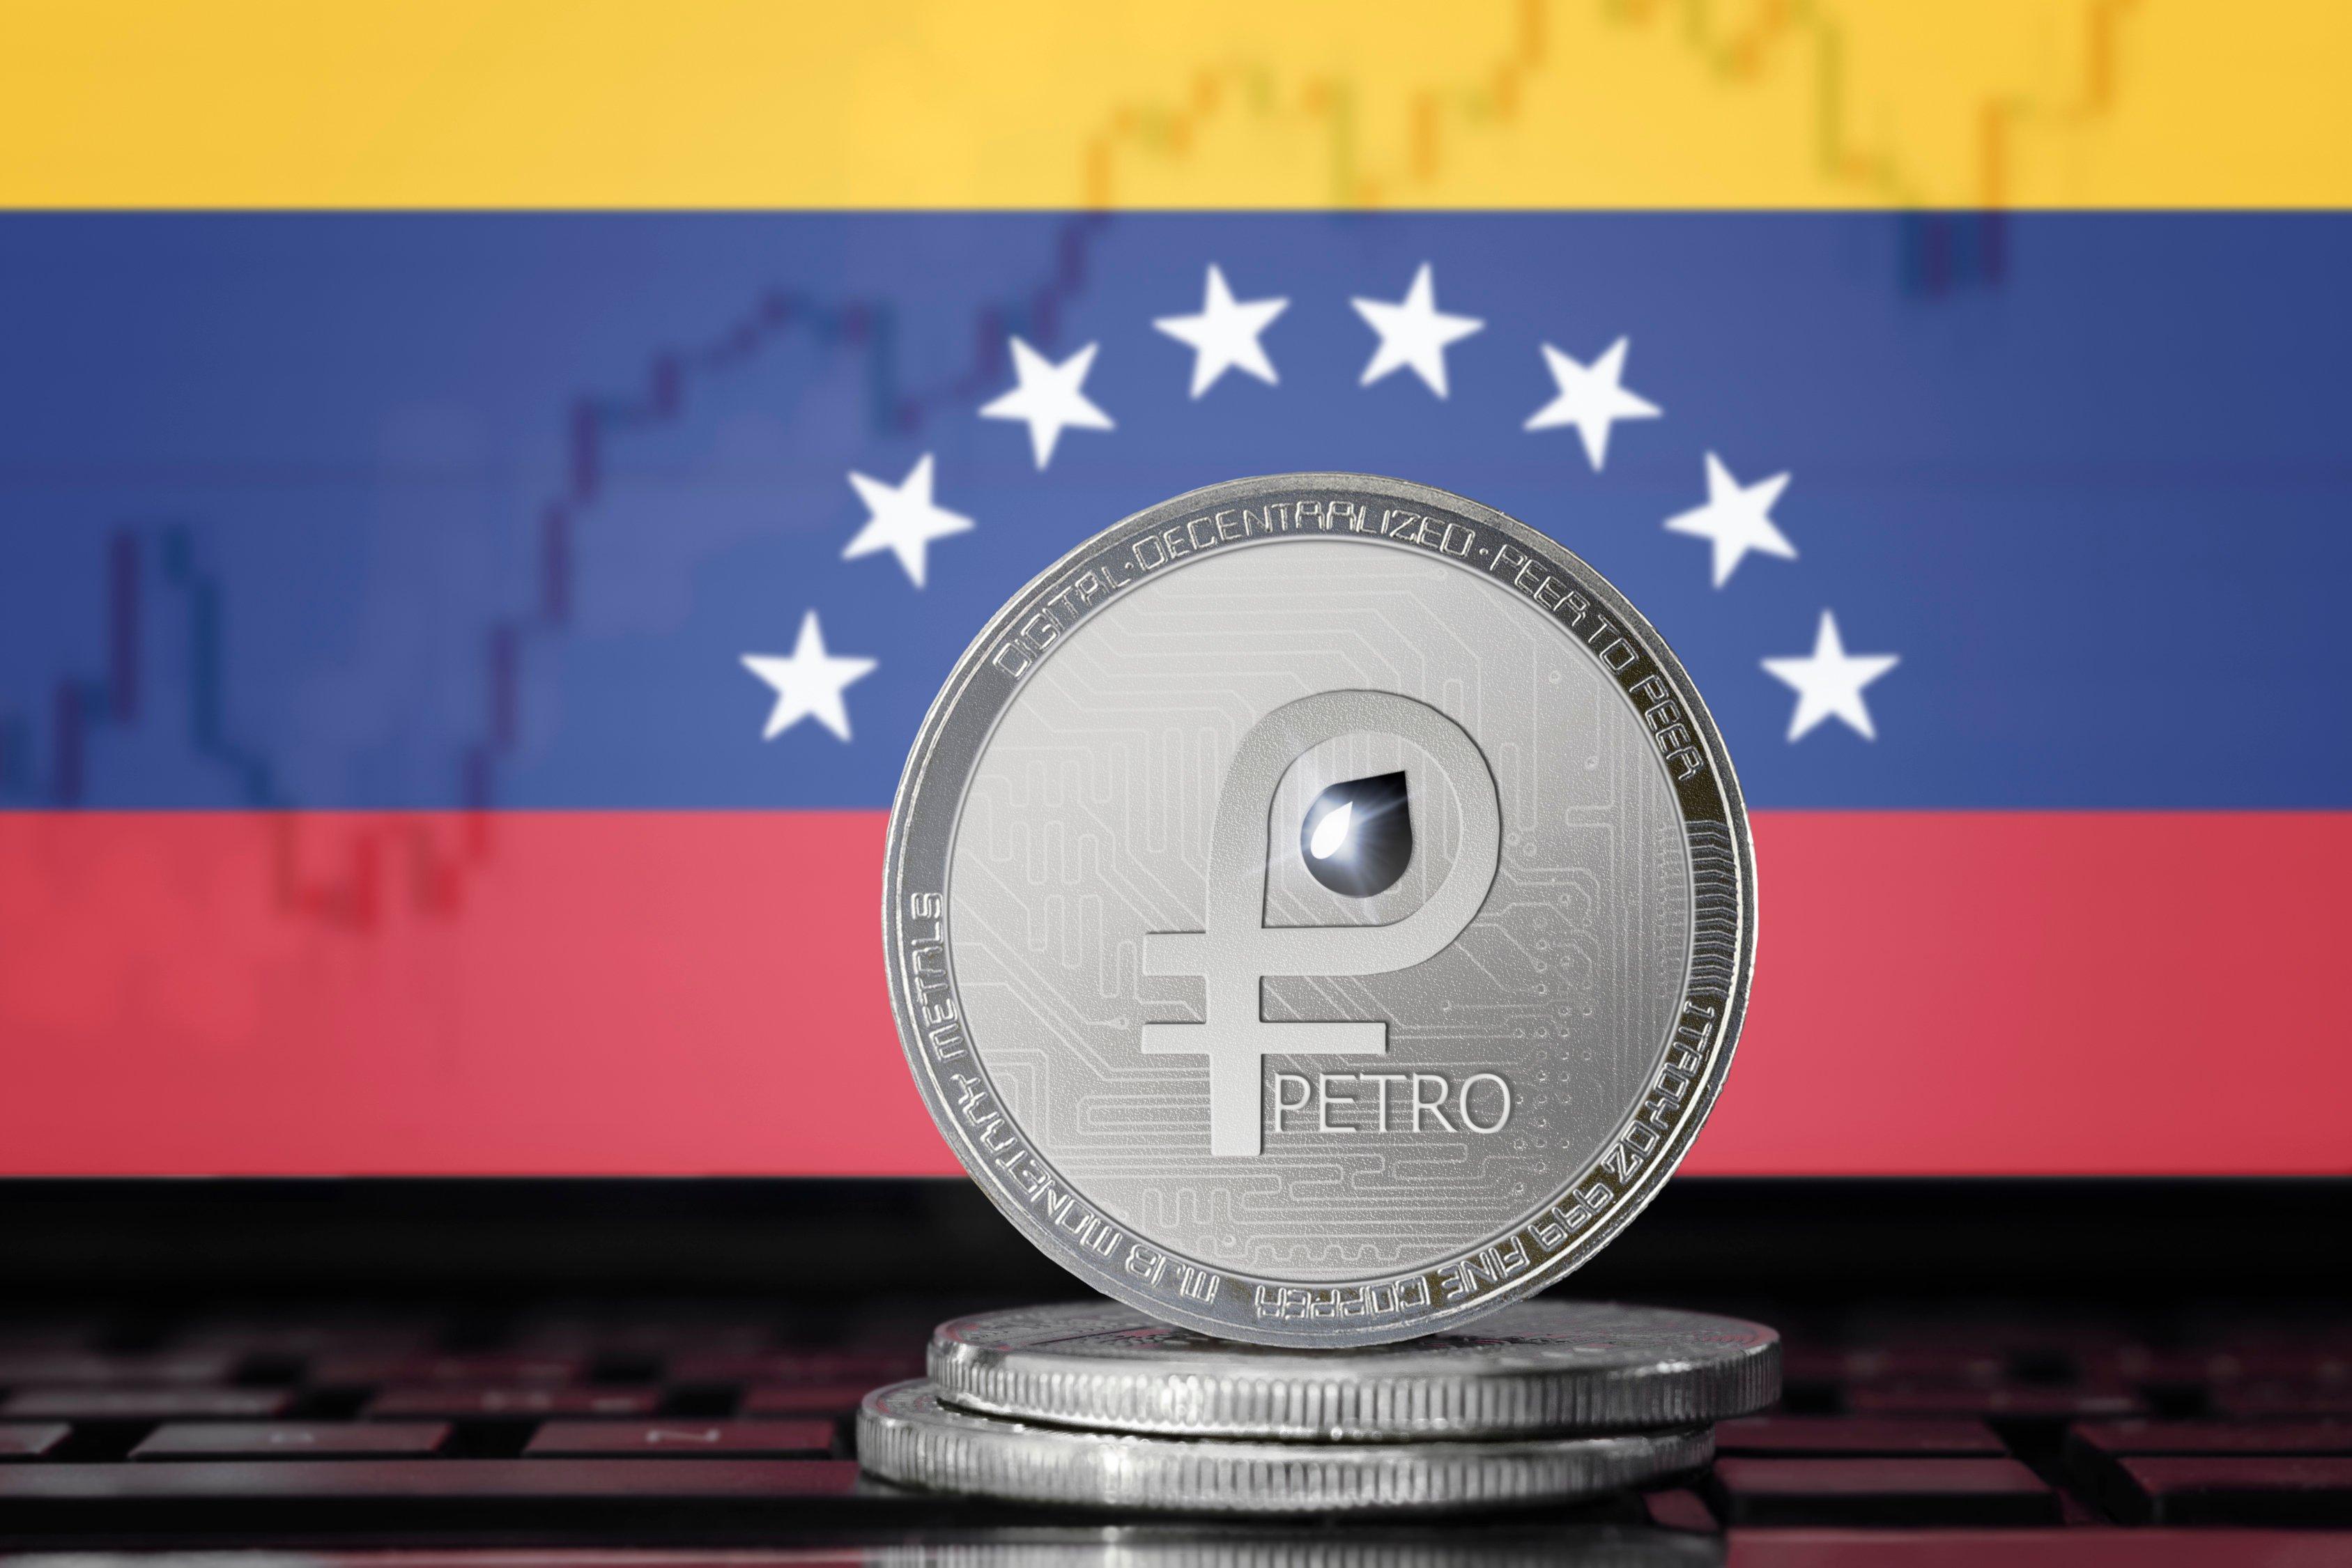 silver petro coin in front of Venezuelan flag